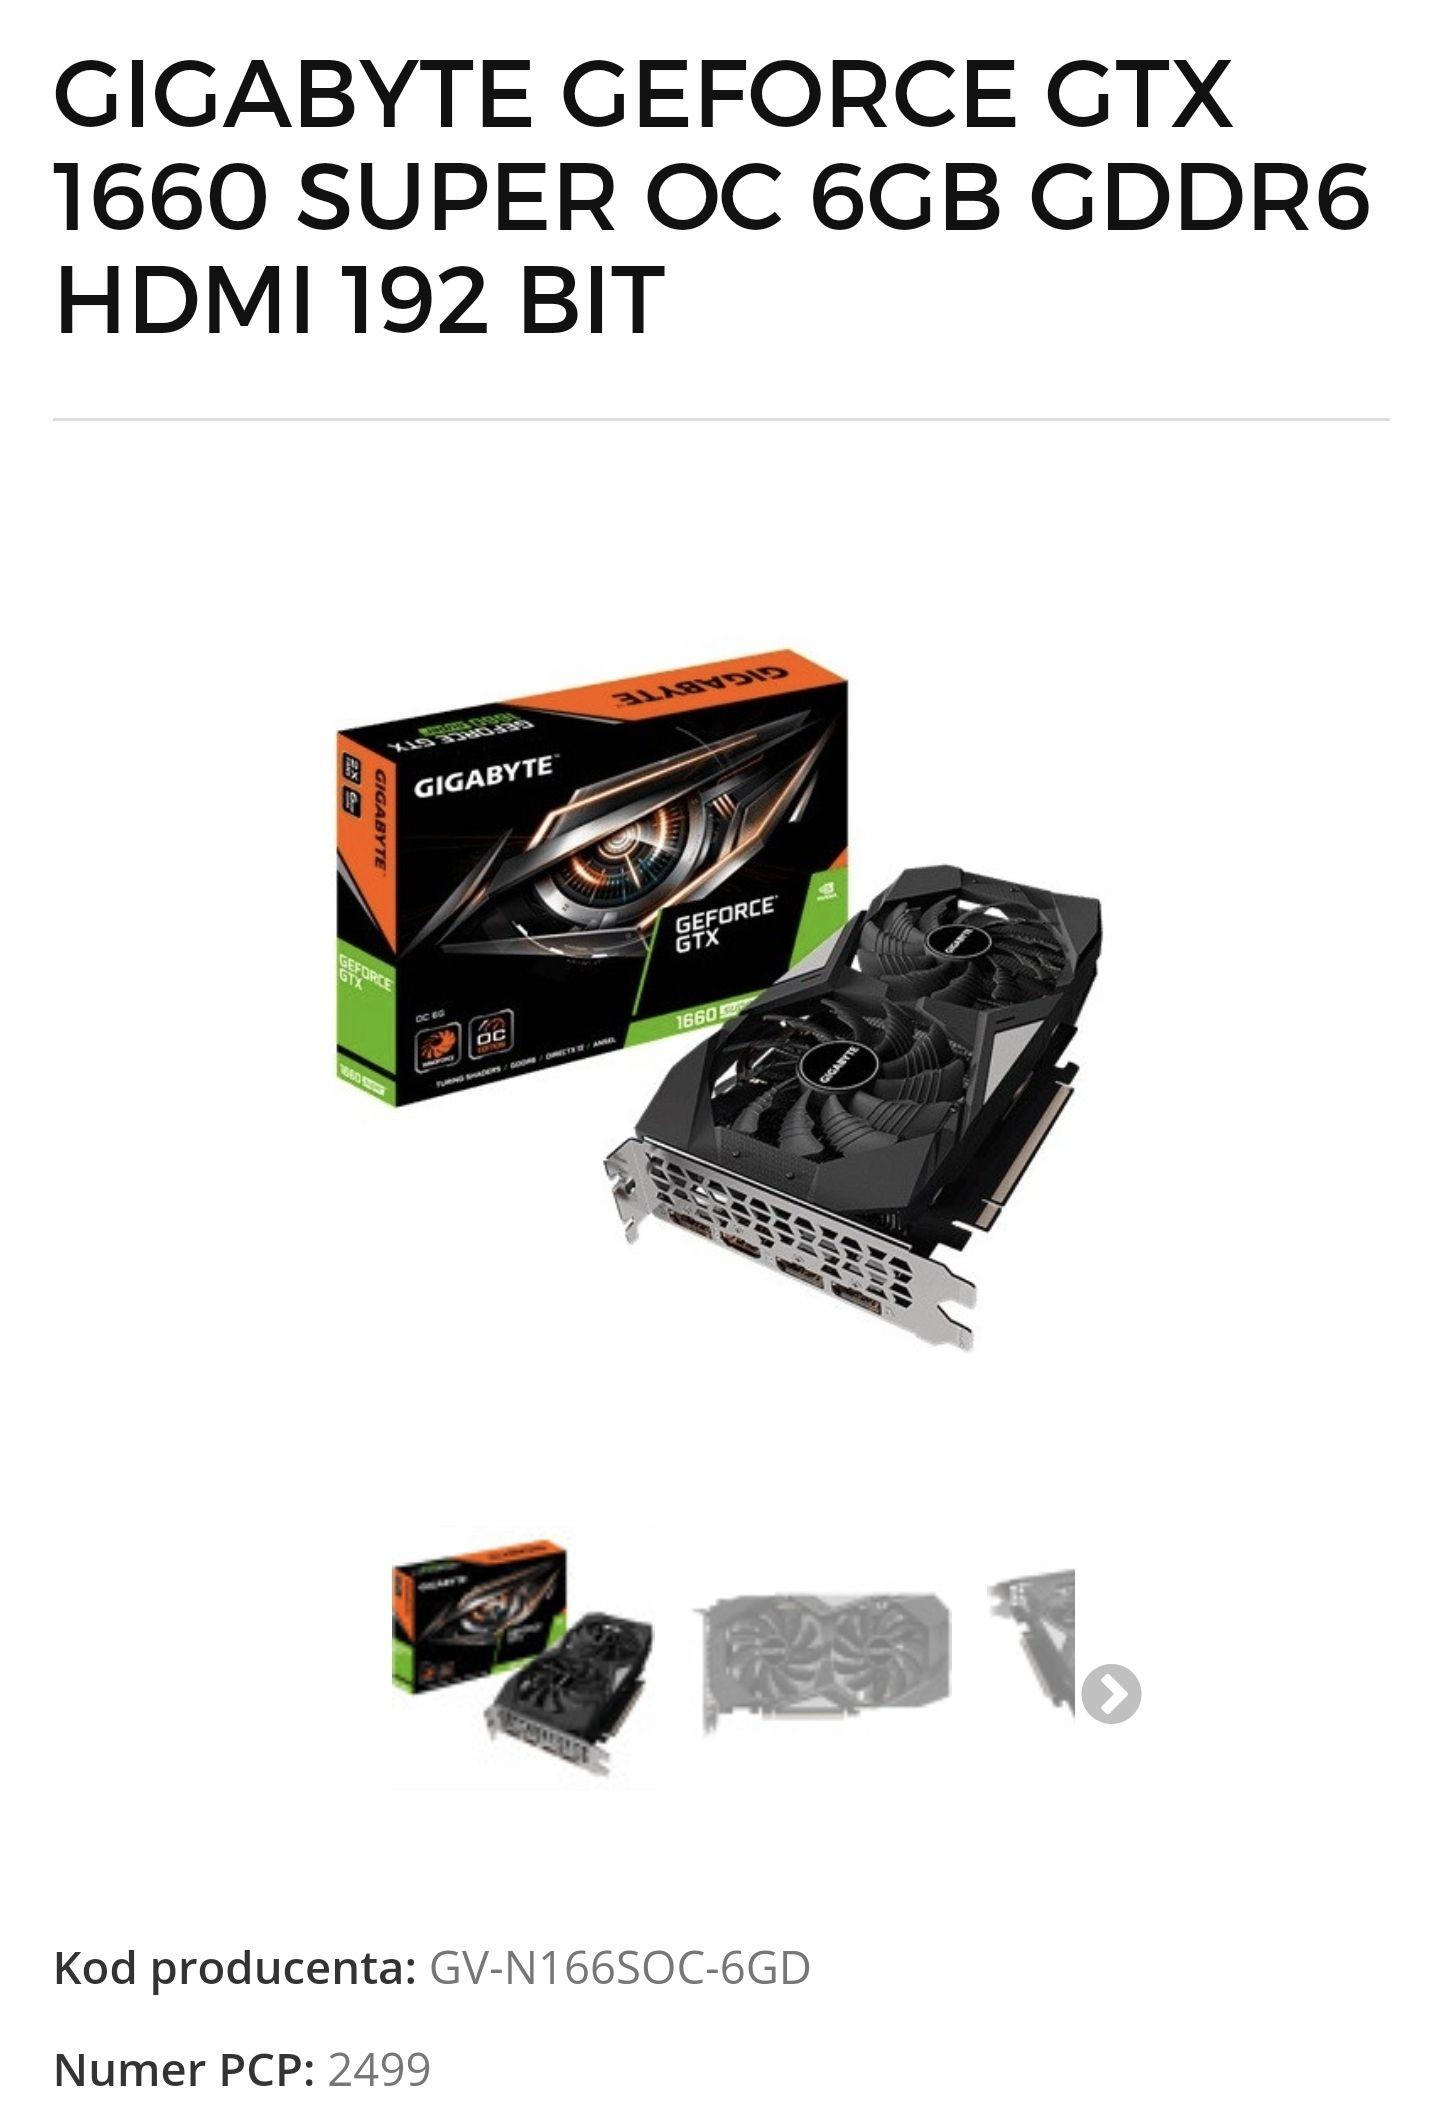 GIGABYTE GEFORCE GTX 1660 SUPER OC 6GB GDDR6 HDMI 192 BIT